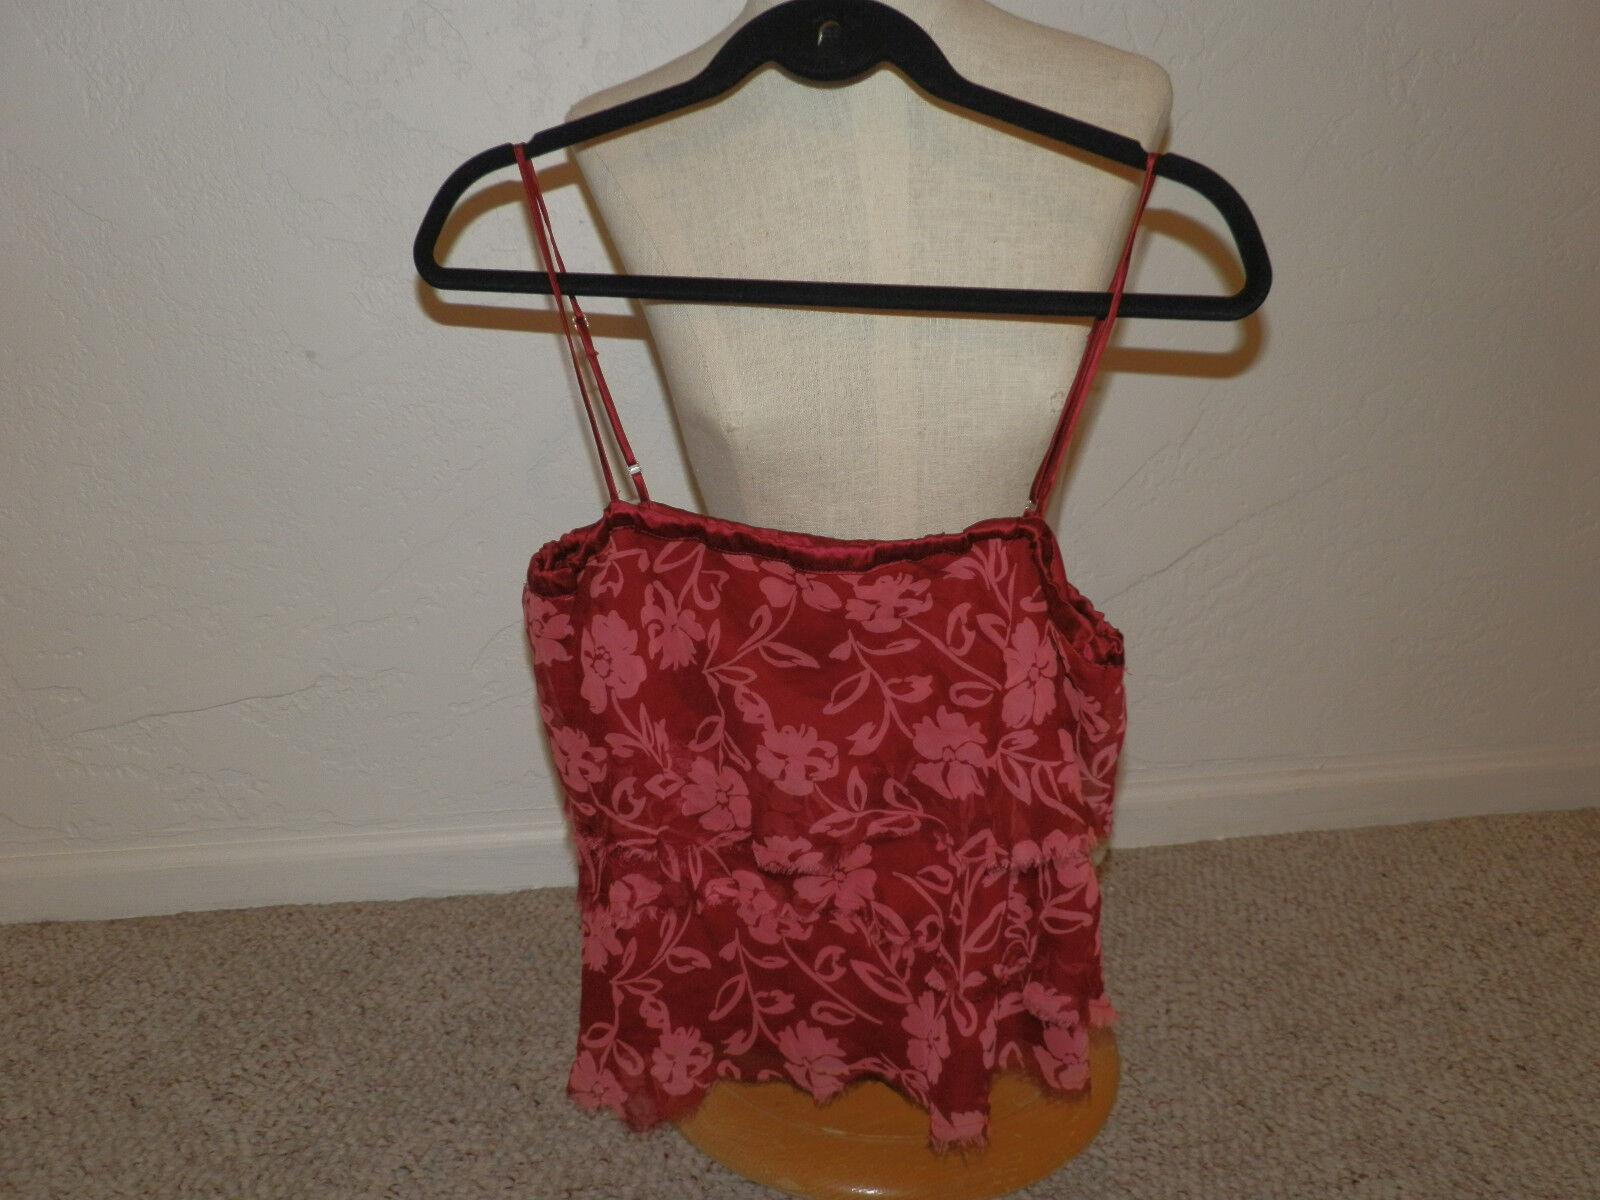 damen shirt Größe 10 Symmetry shirt Größe 10 rot shirt Größe 10 New